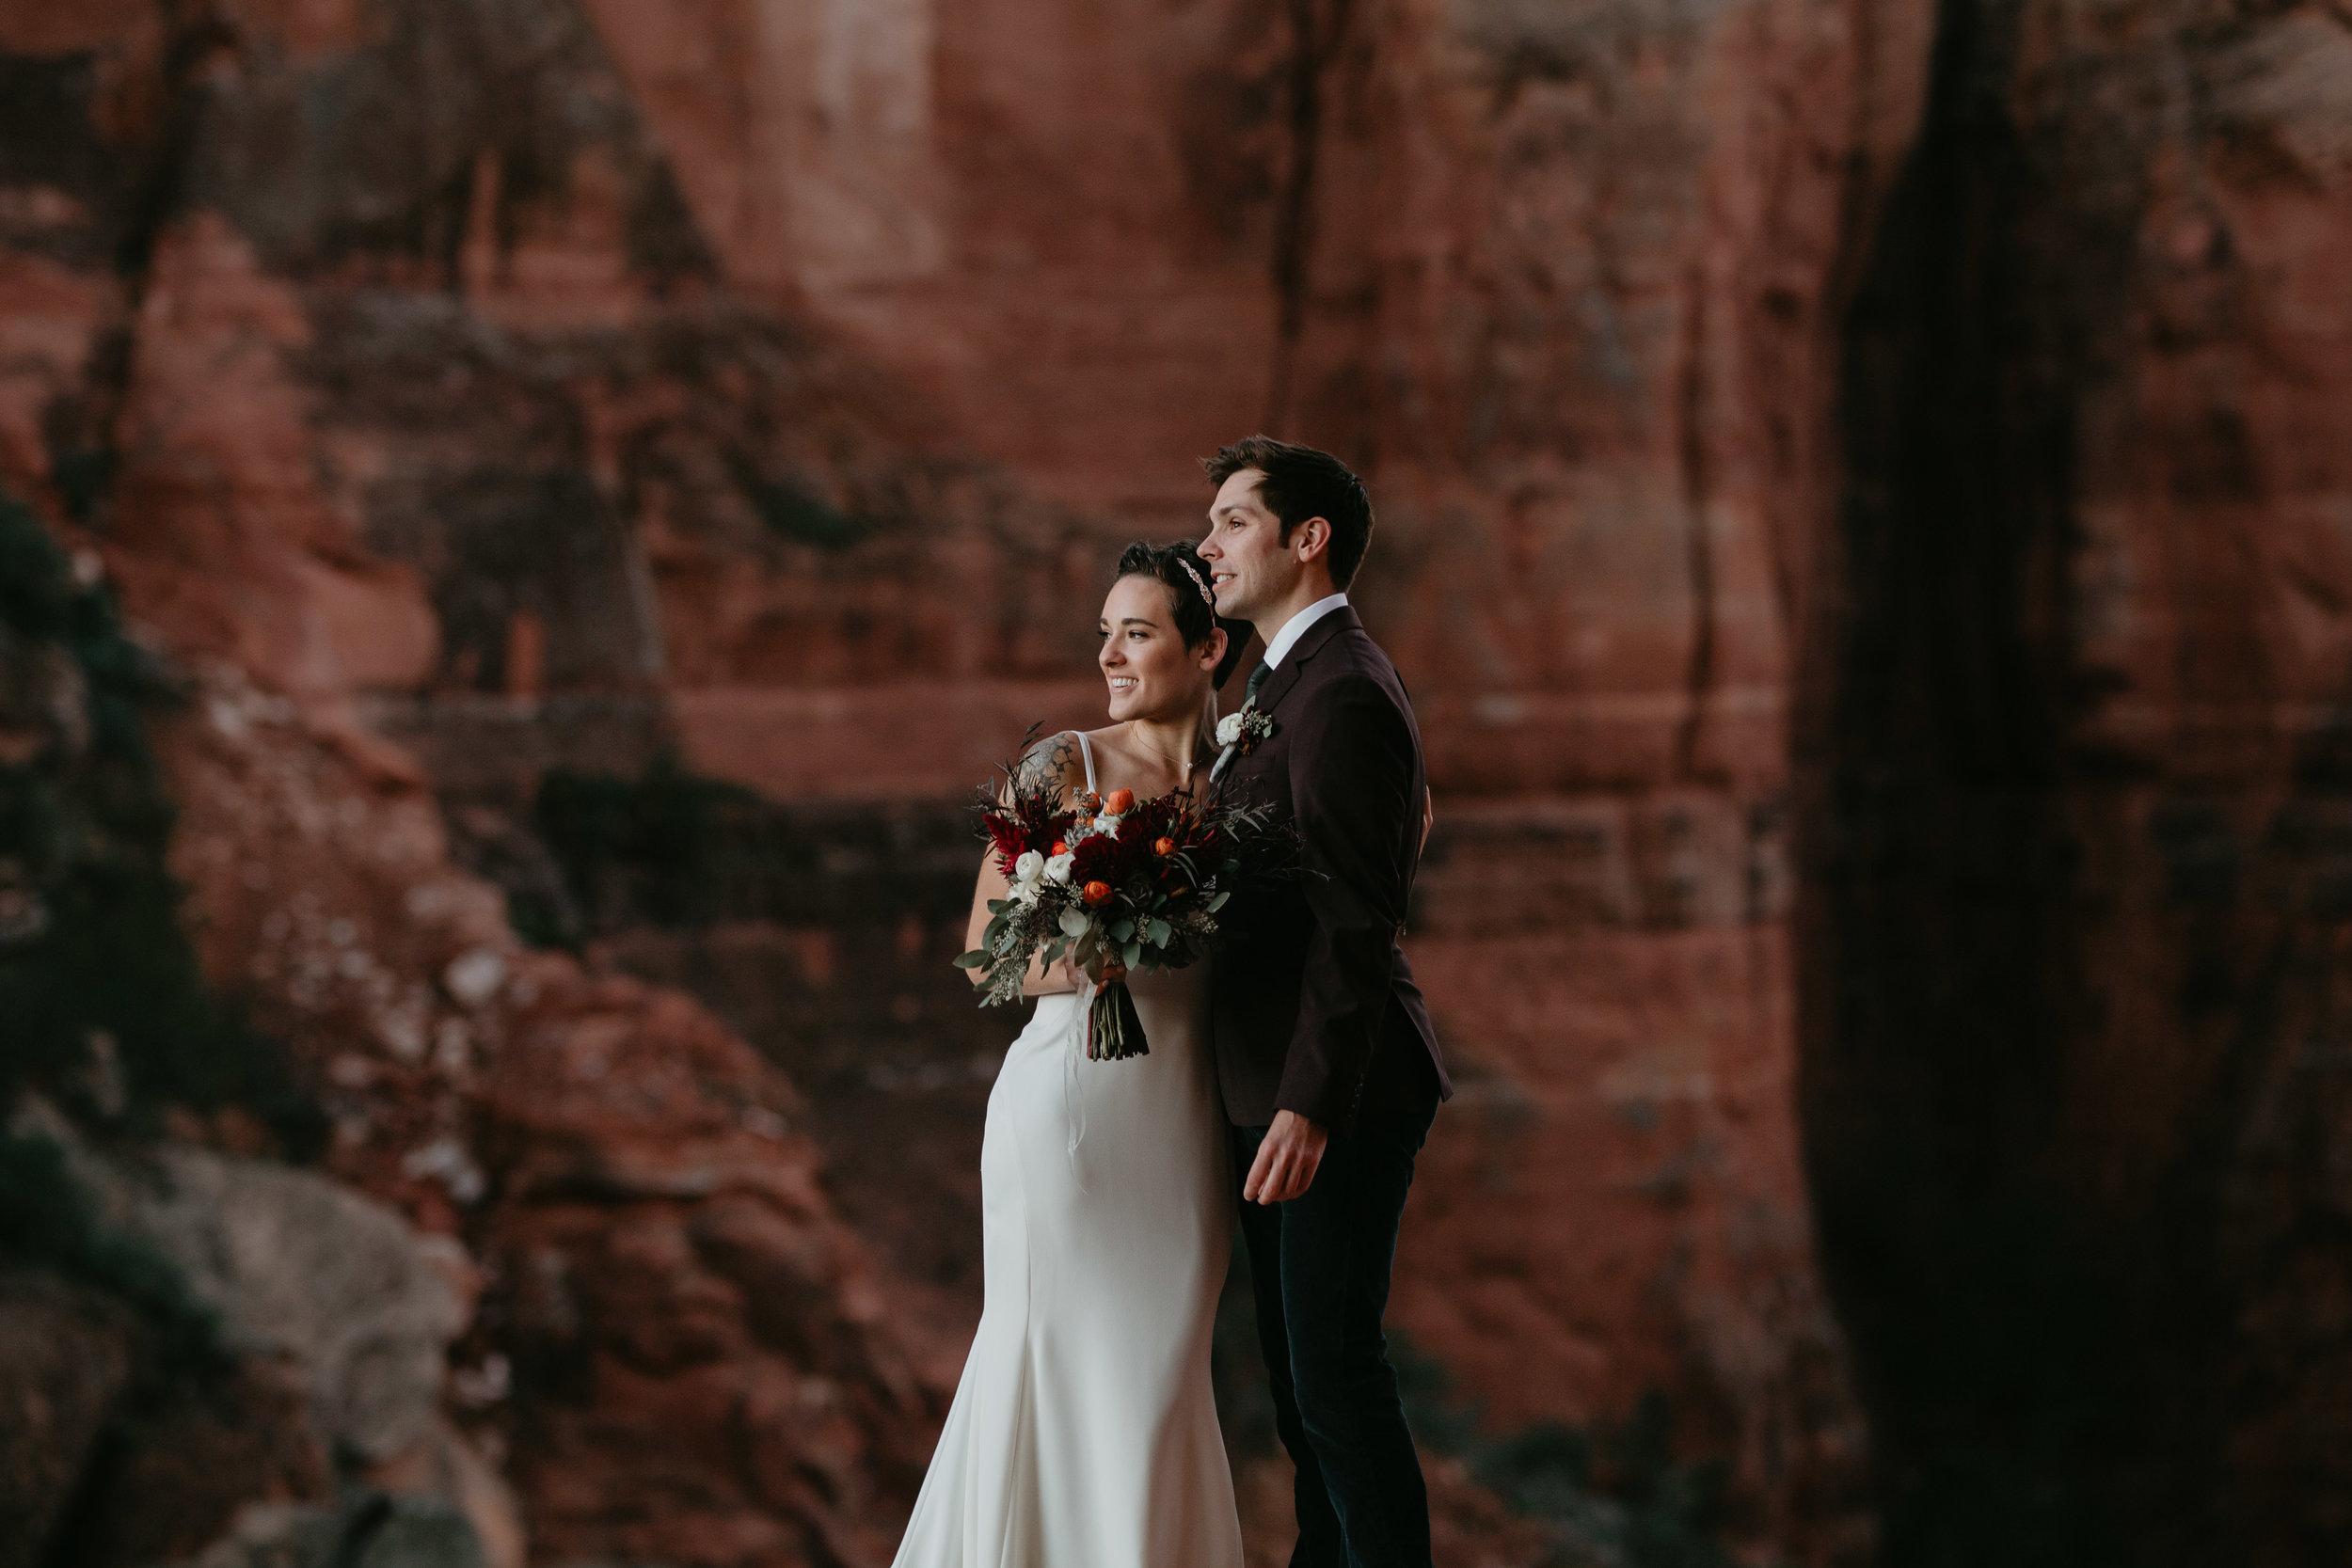 nicole-daacke-photography-sedona-arizona-destination-elopement-wedding-photographer-catherdral-rock-hiking-elopement-sedona-river-elopement-photos-desert-rock-wedding-photographer-laid-back-spontaneous-elopement-18.jpg